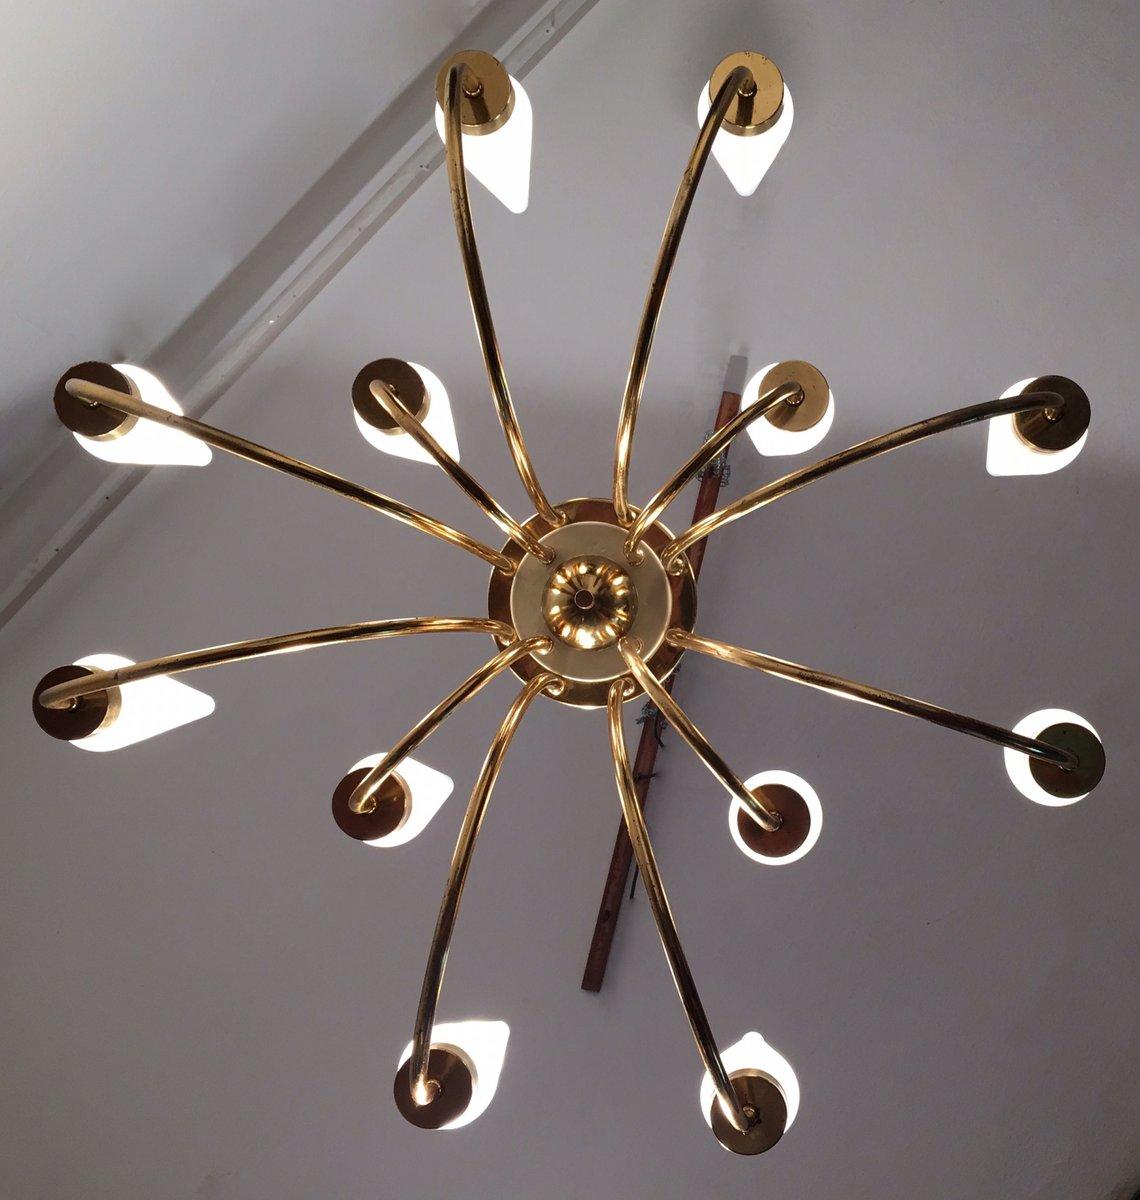 Italian twelve arm brass chandelier from arredoluce 1950s for Arredo luce